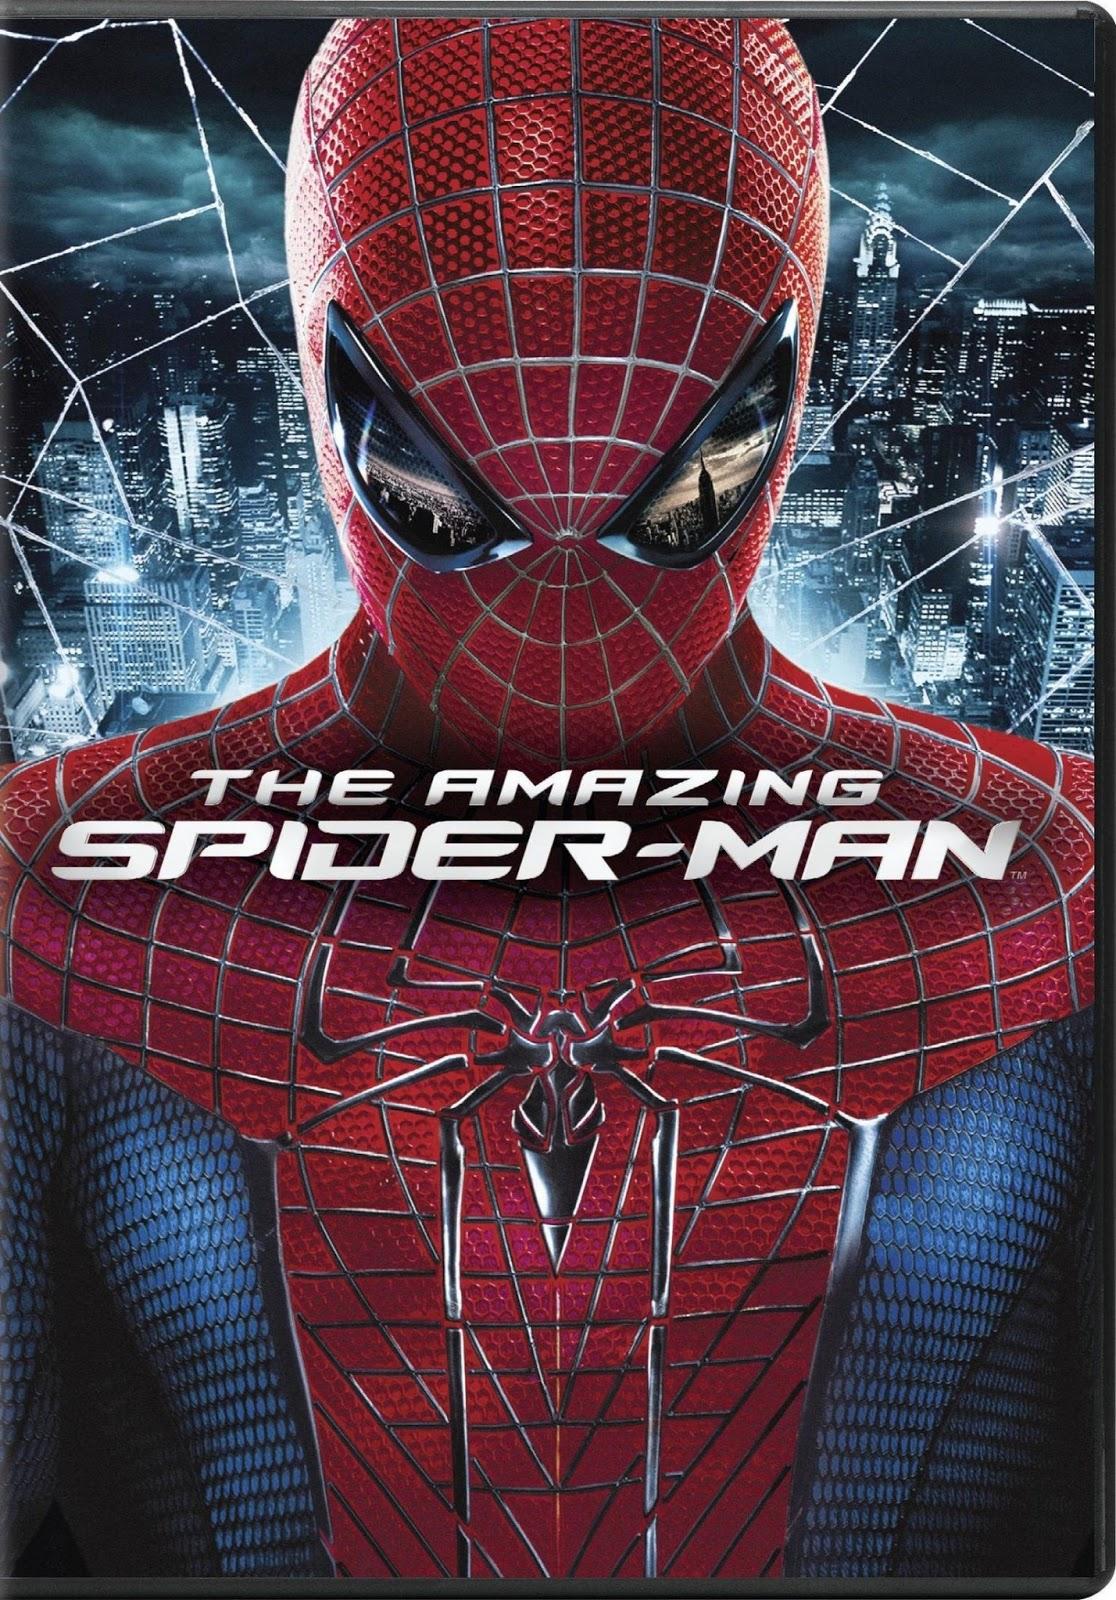 DOWNLOAD FILM AMAZING SPIDERMAN SUB INDONESIA | Box-cinemaku